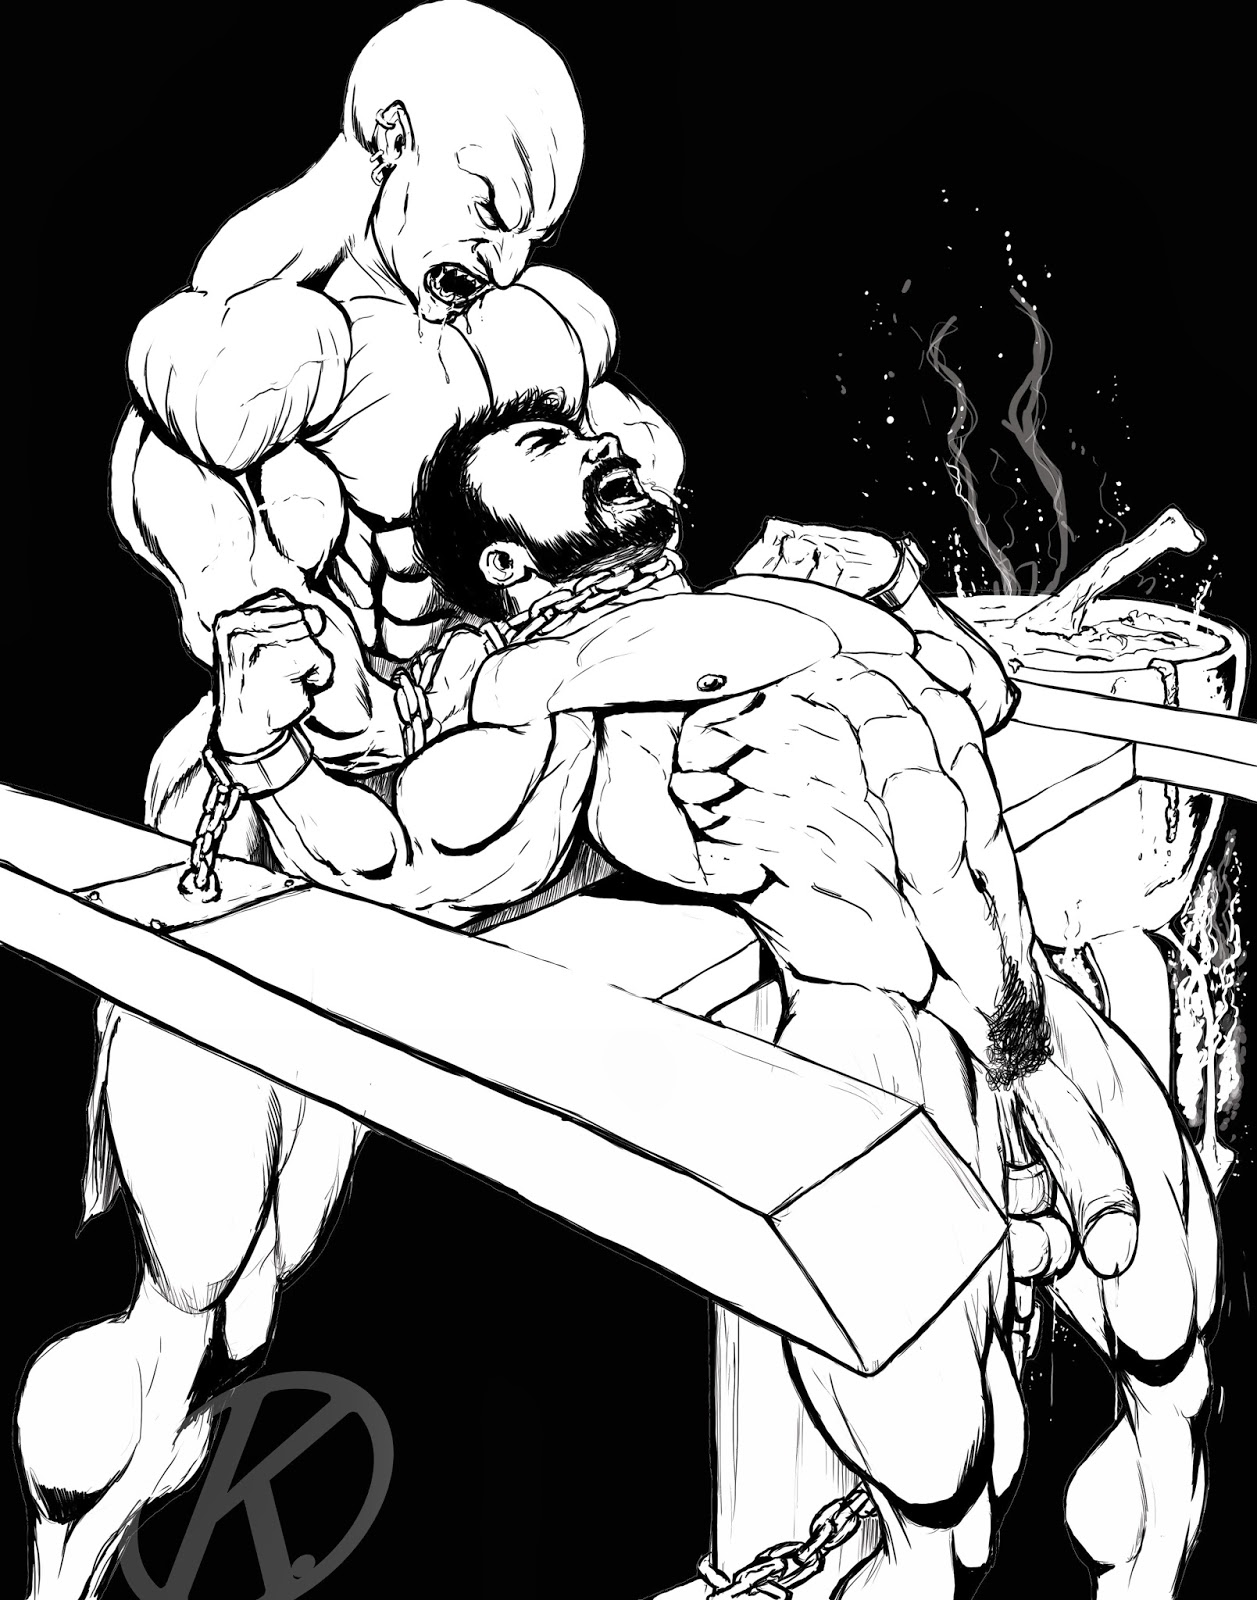 Art gay bdsm Painful Gay